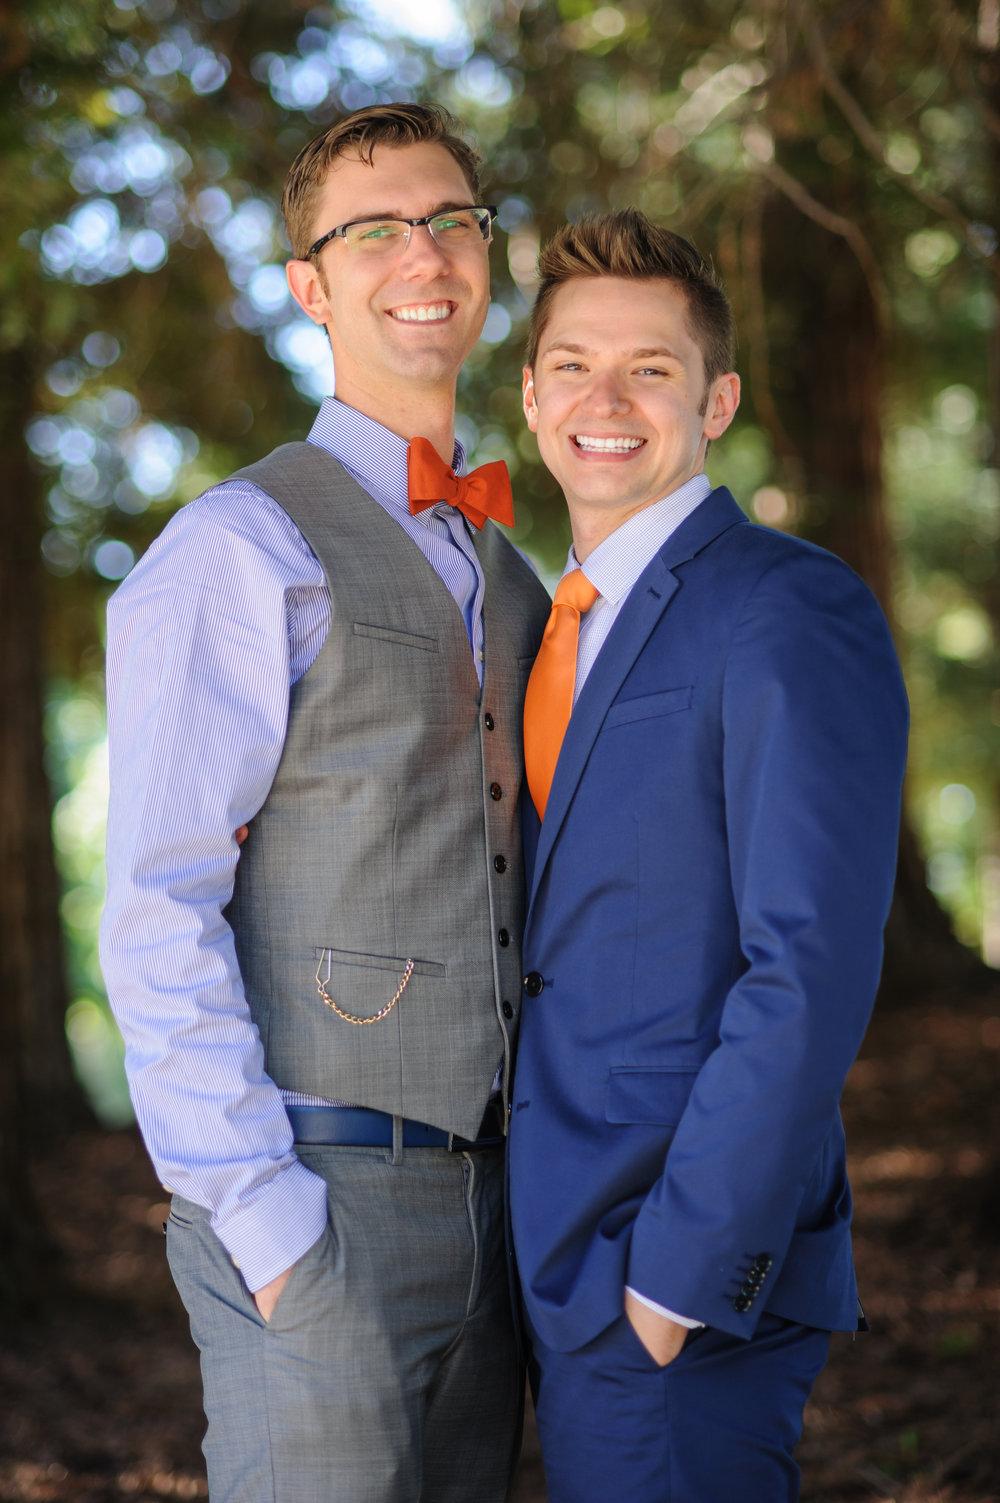 josh-parker-019-same-sex-sacramento-wedding-photographer-katherine-nicole-photography.JPG